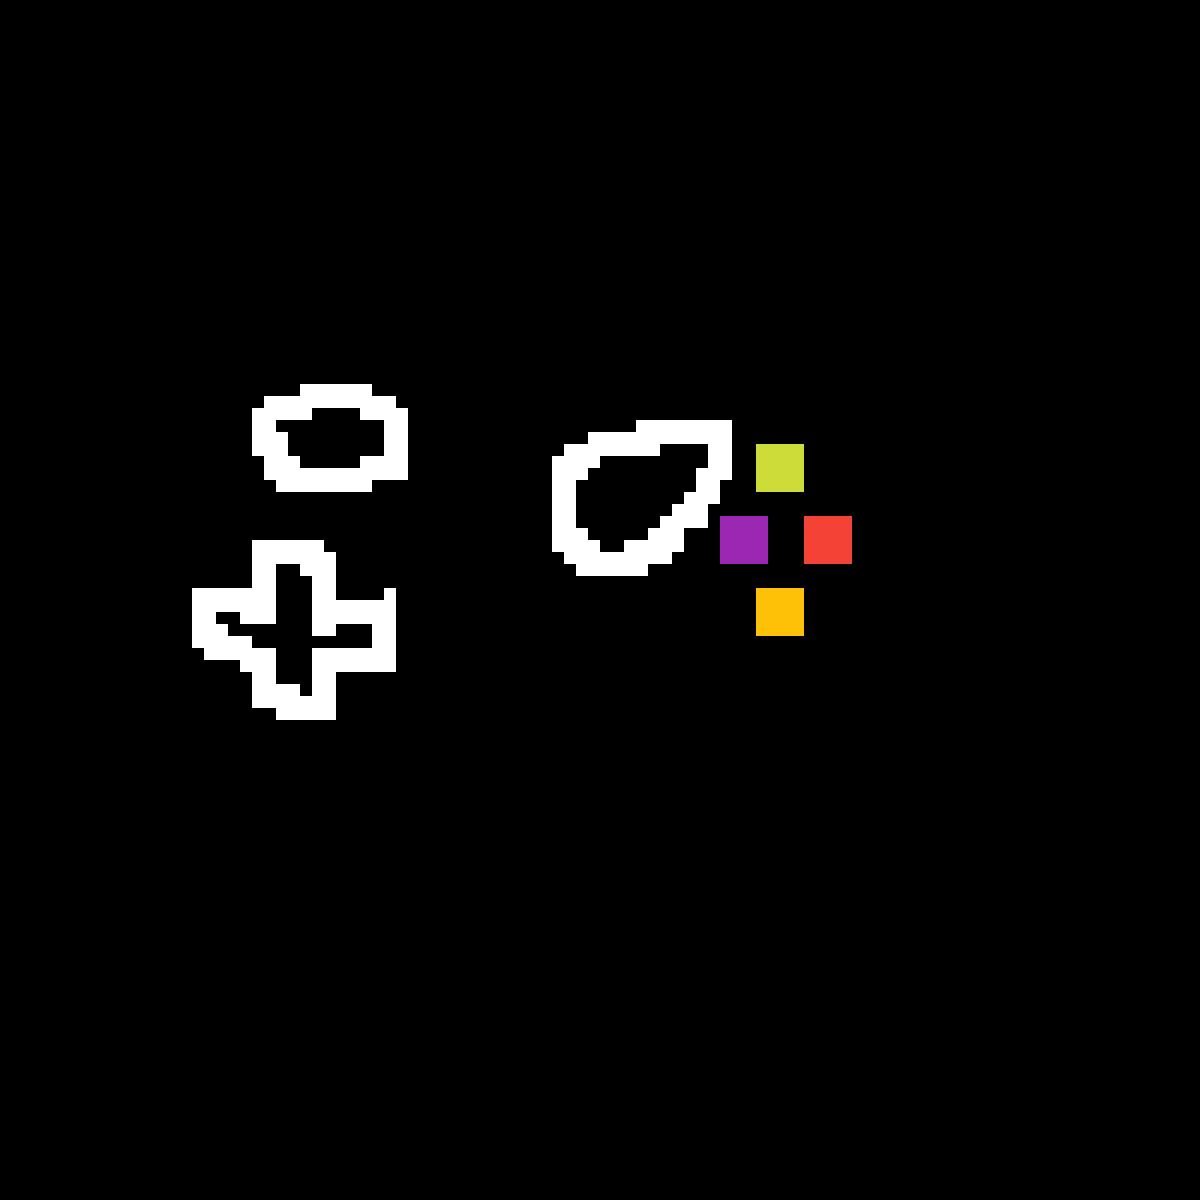 Xbox Controller by Dark-Illiax